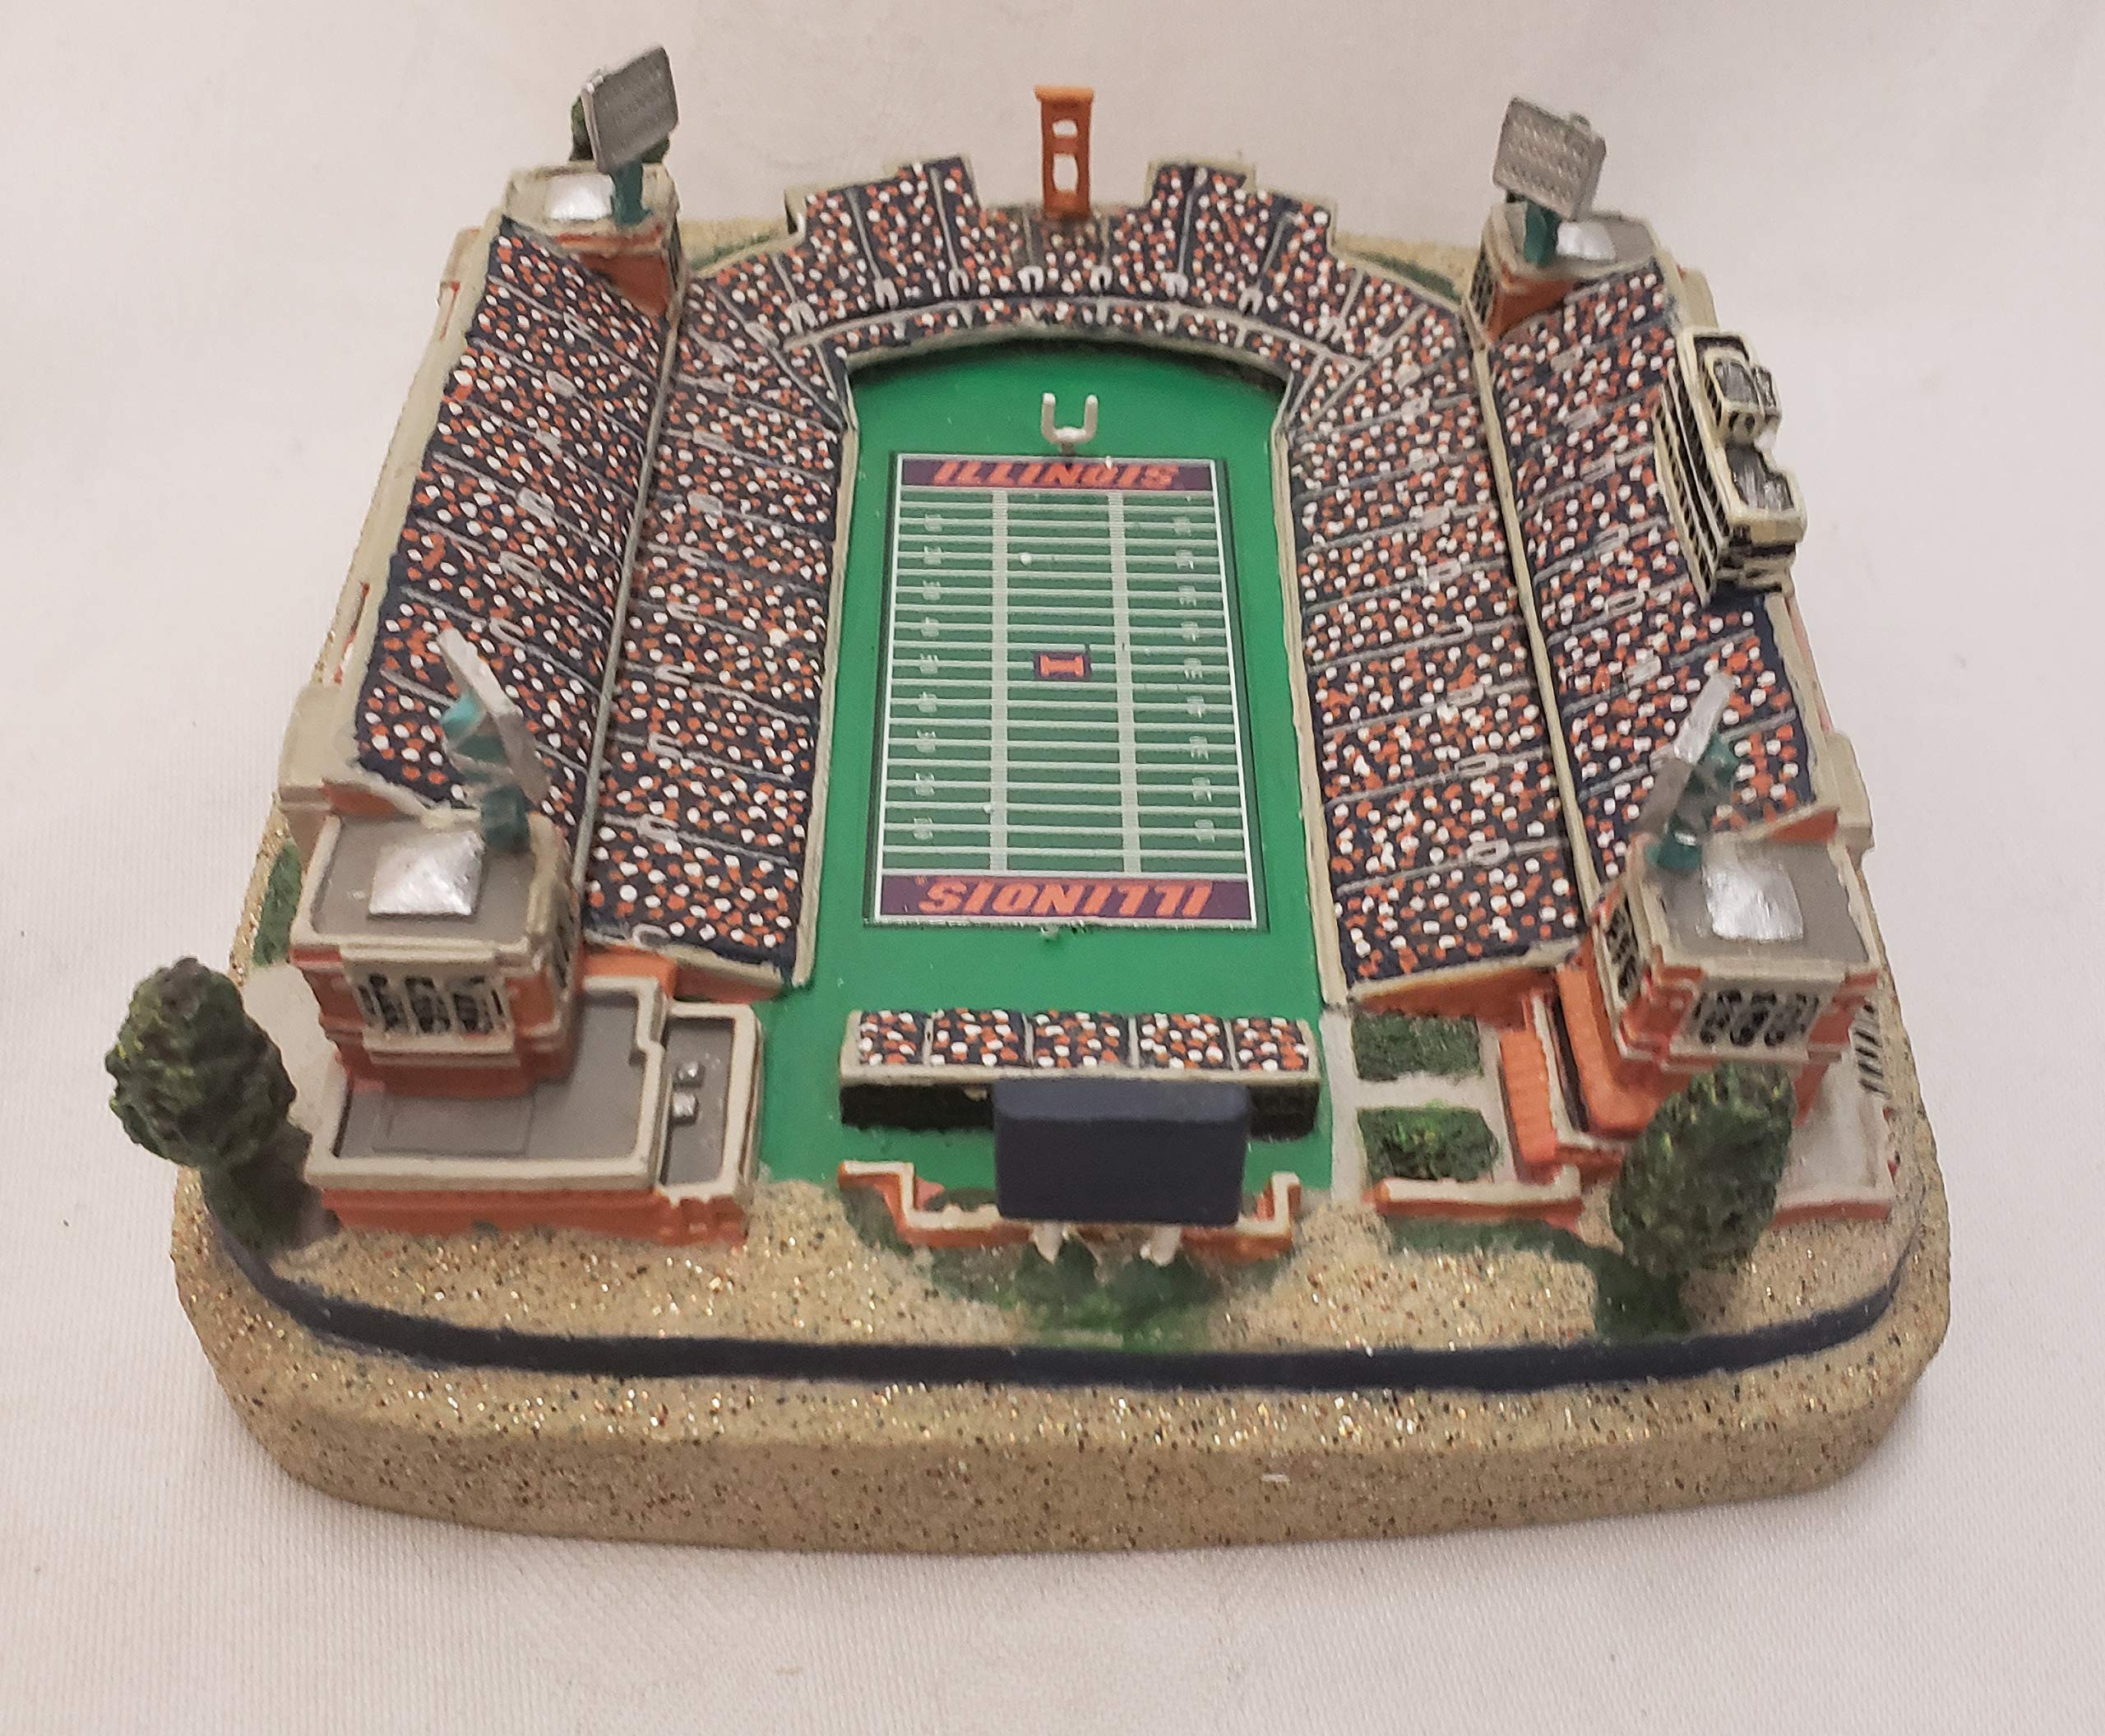 University of Illinois Fighting Illini Gold Series Stadium Replica